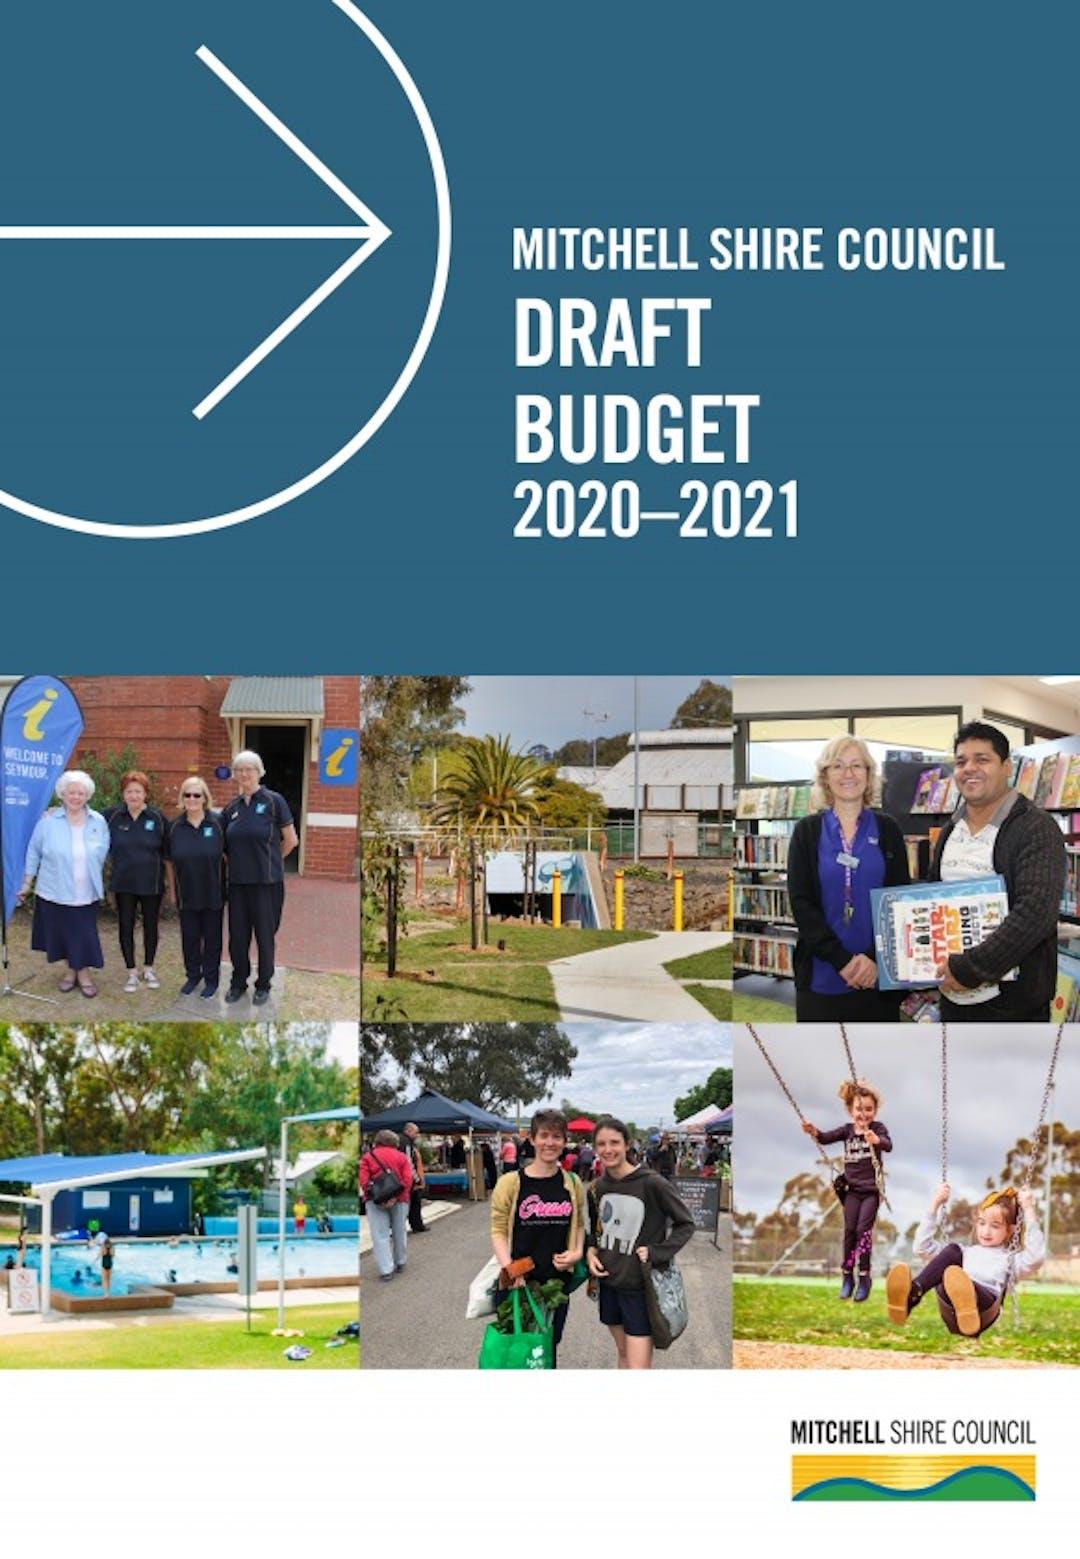 Budget document cover